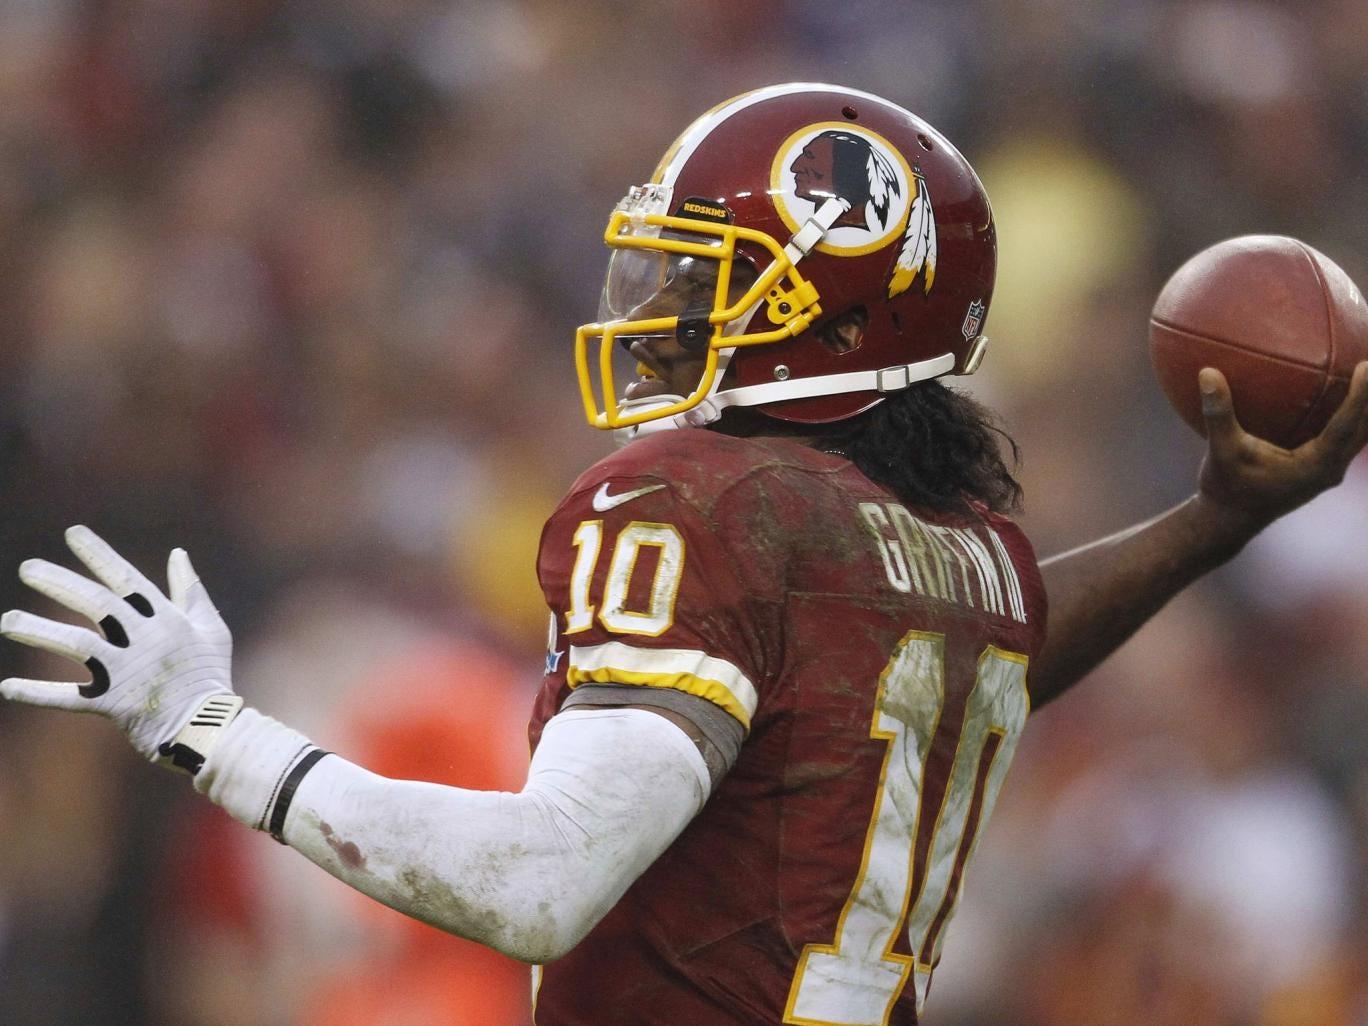 On the ball: Washington Redskins quarterback Robert Griffin